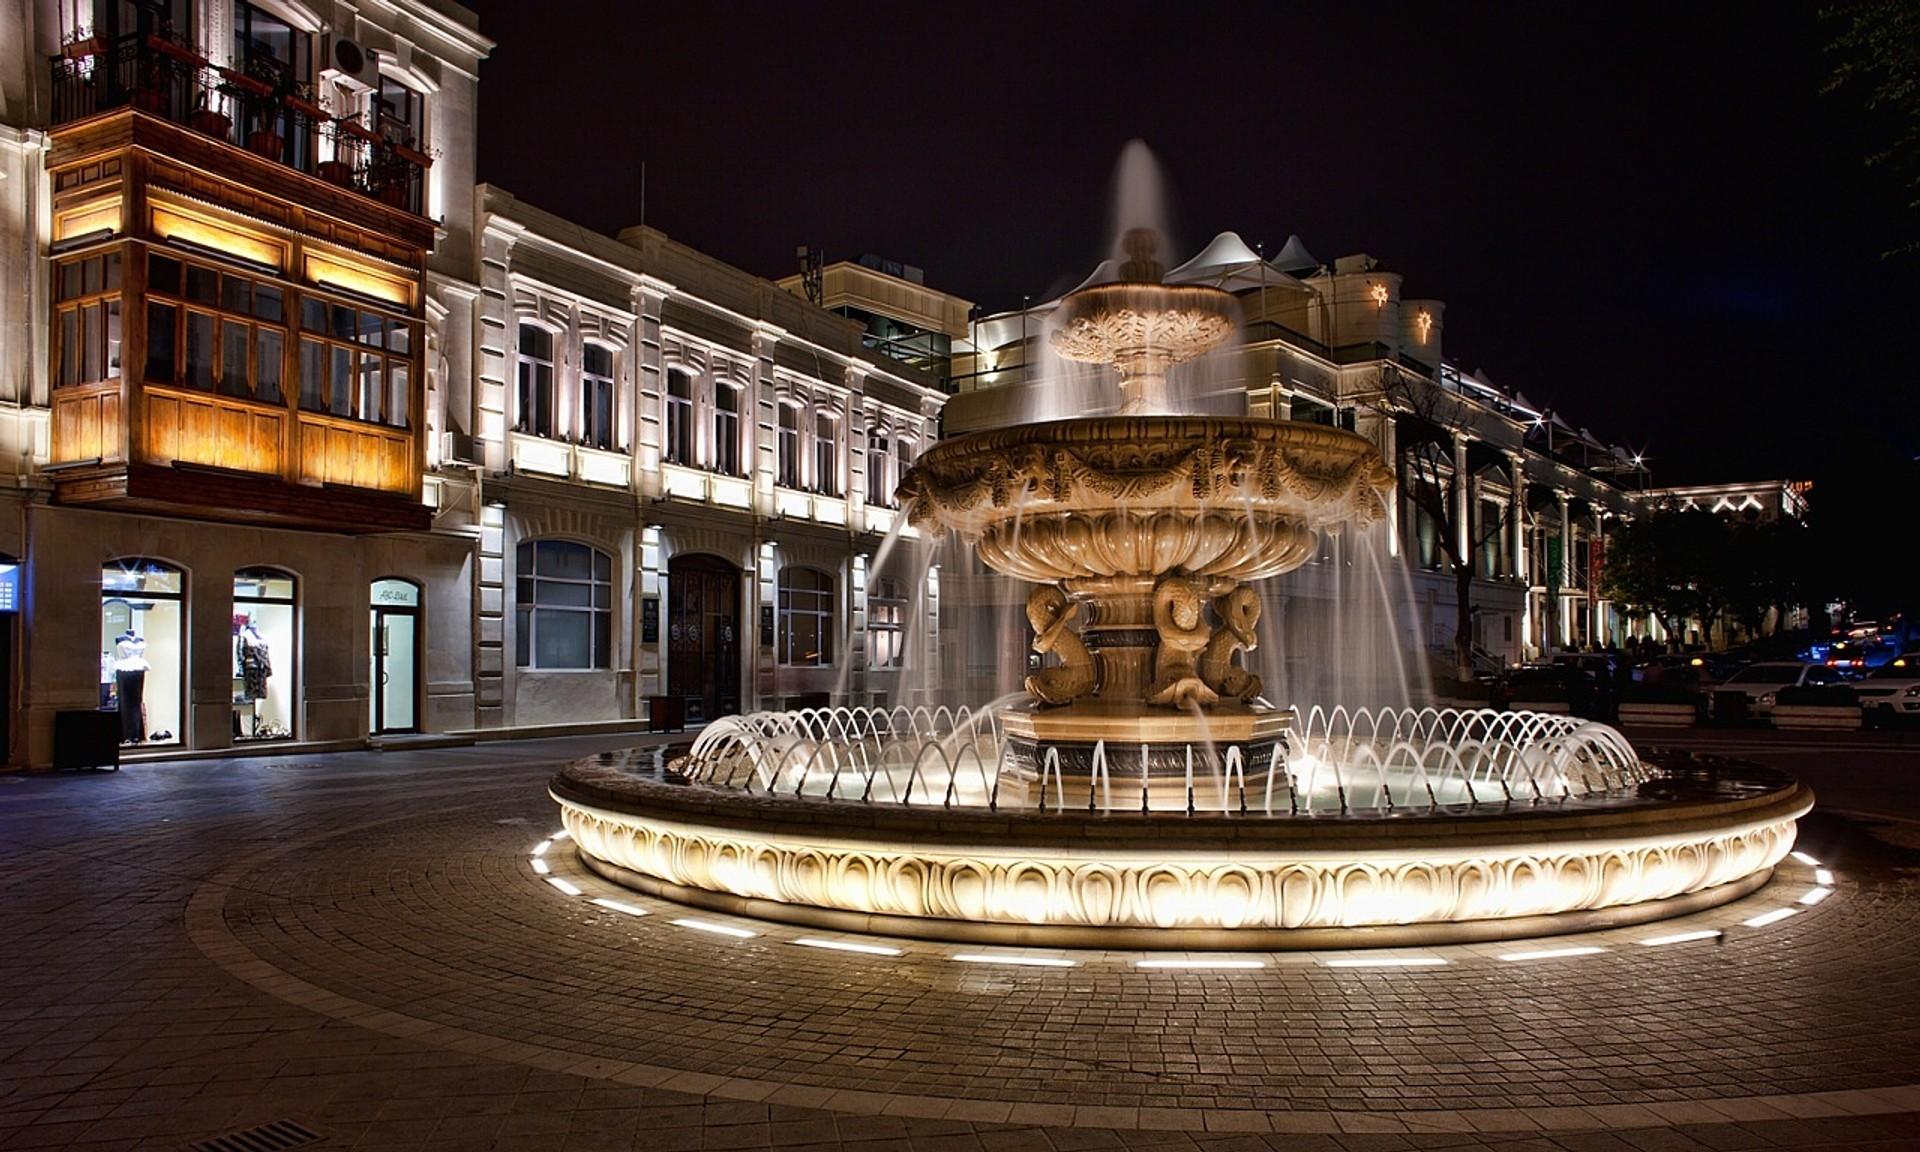 площадь-фонтанов-Баку-Азербайджан